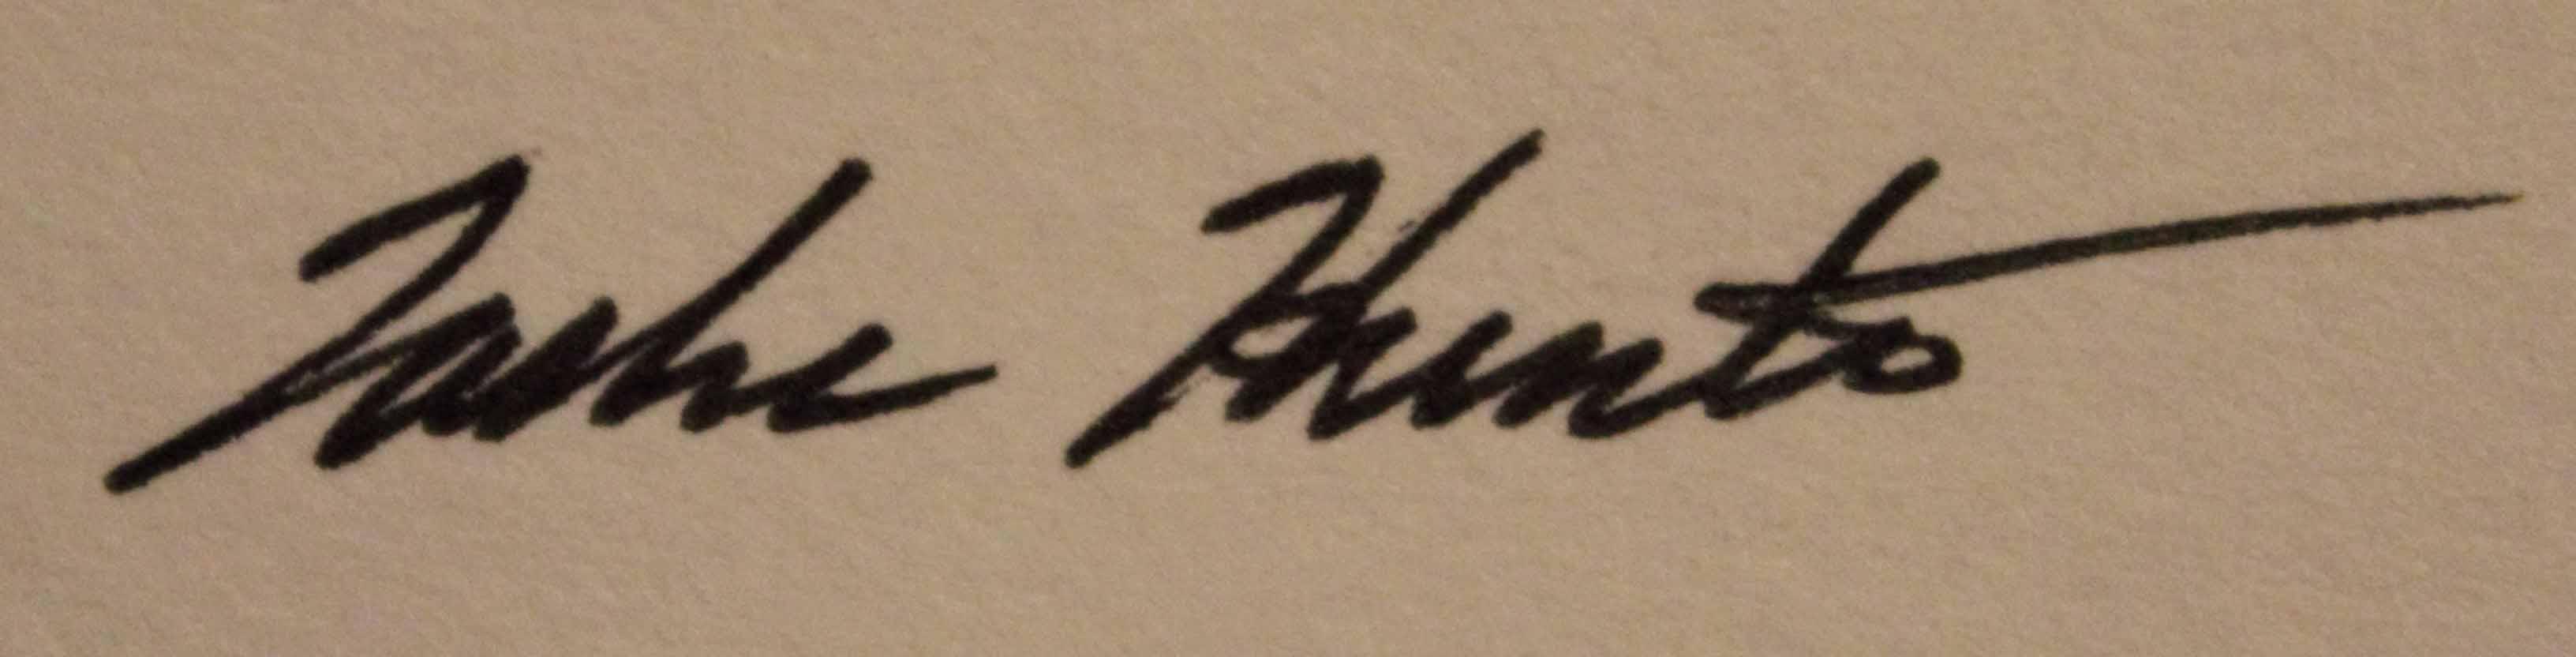 Tasha Hunter's Signature